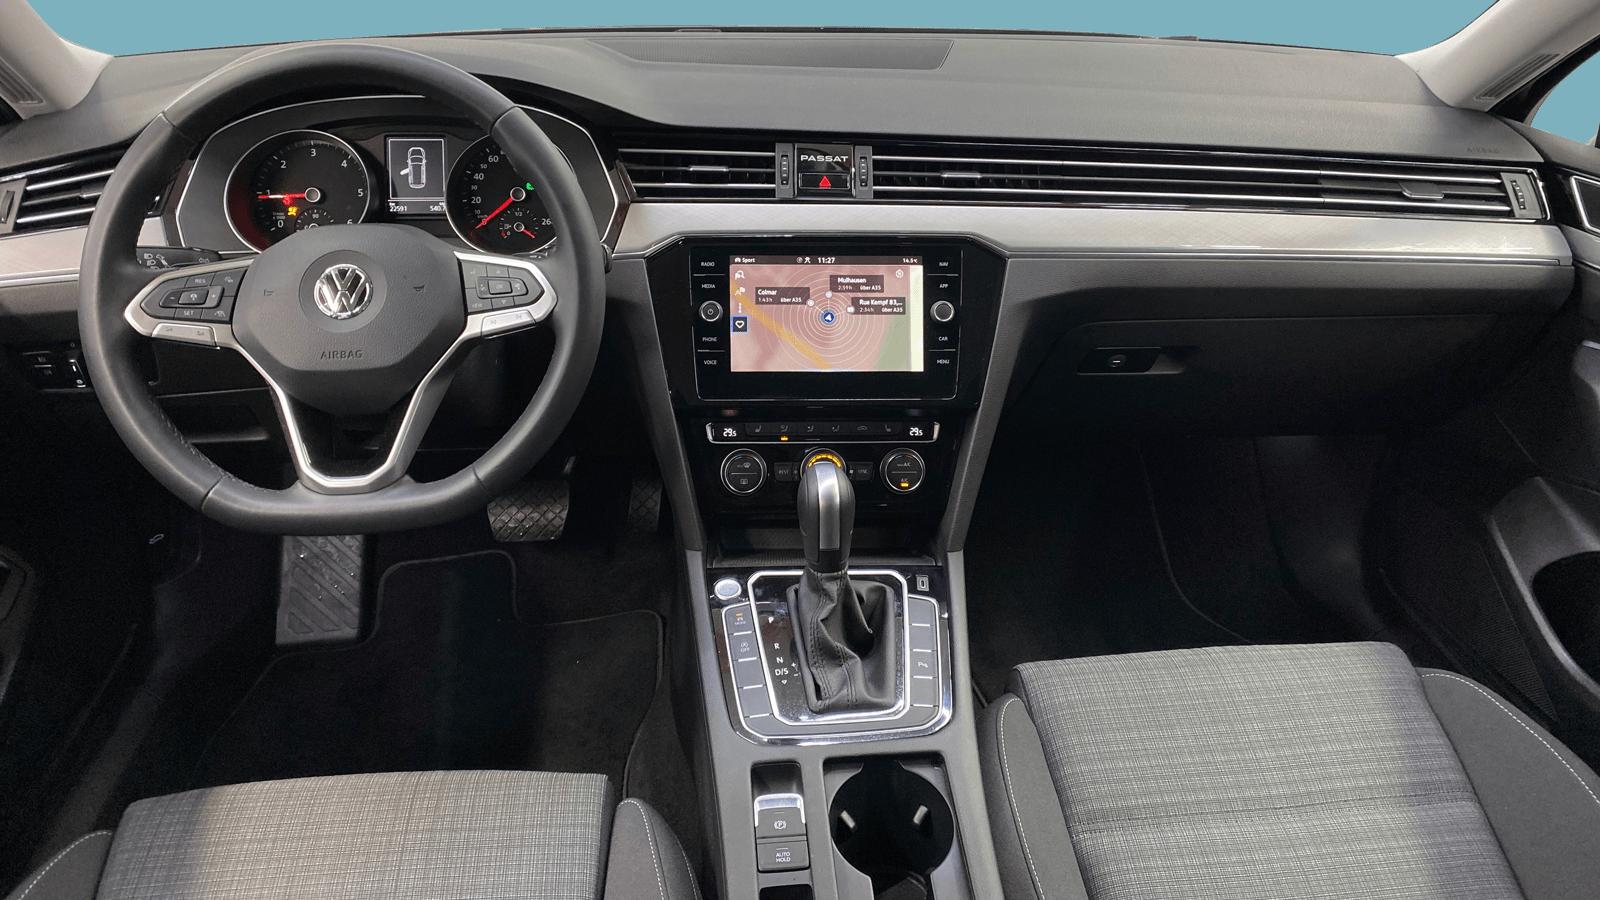 VW Passat Variant Grey interior - Clyde car subscription